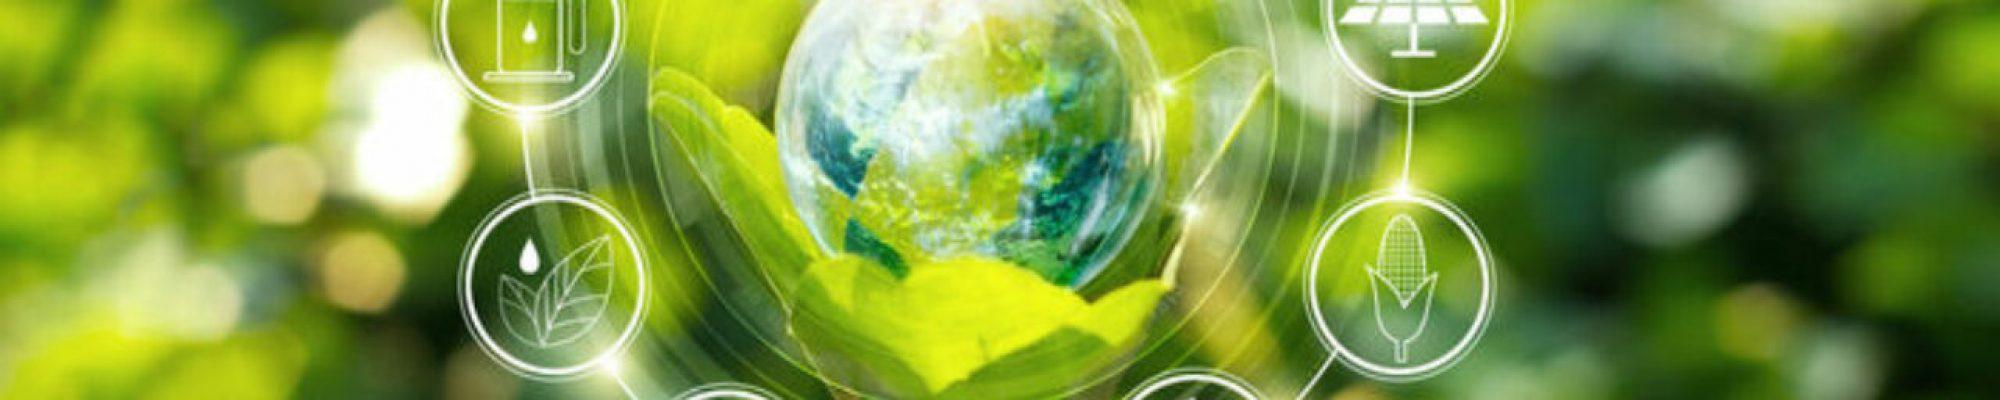 ecologia-1280x720